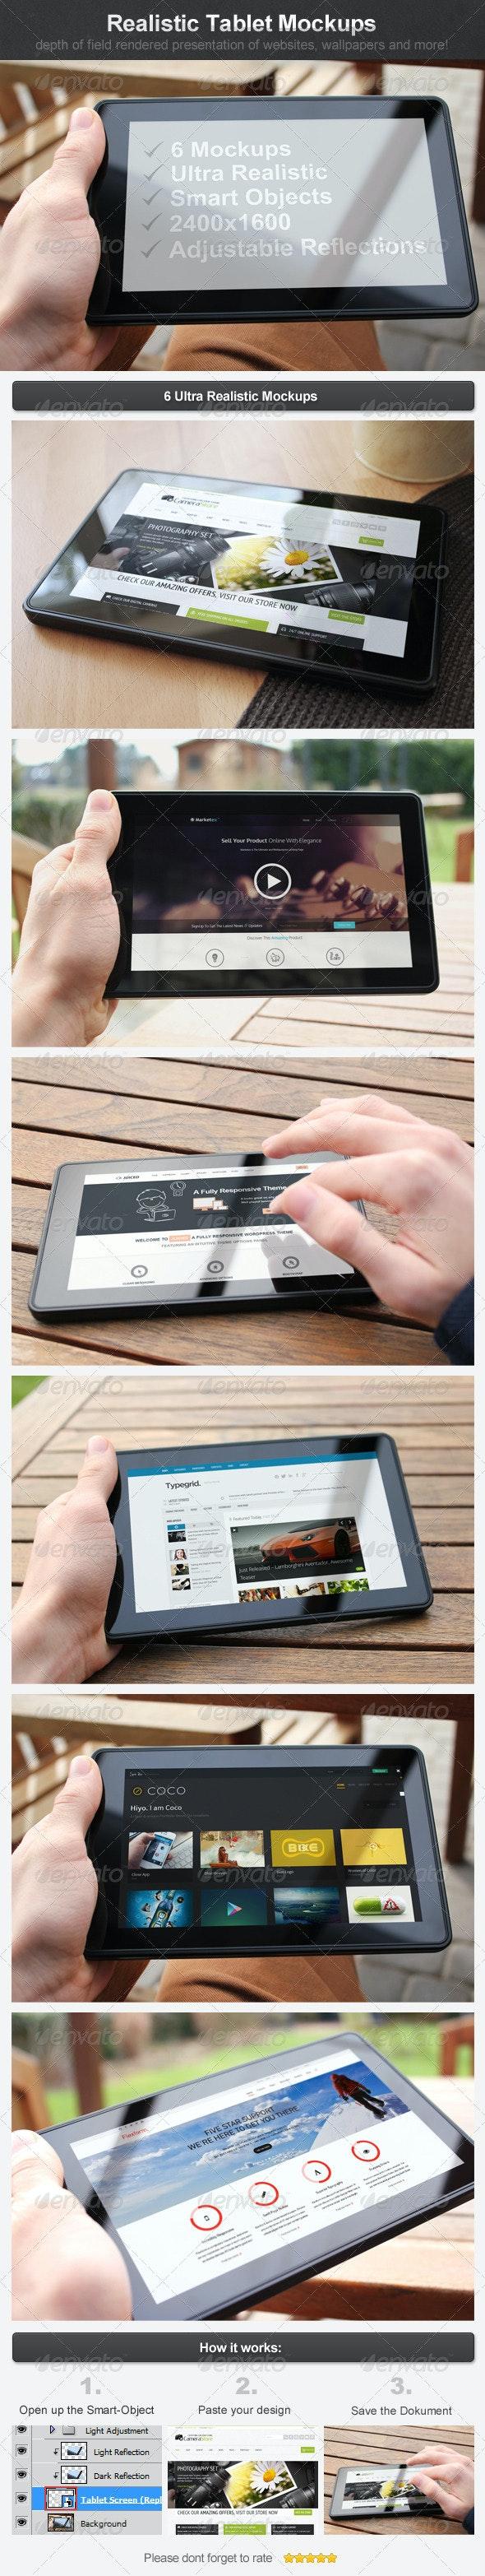 Realistic Tablet Mockups - Mobile Displays